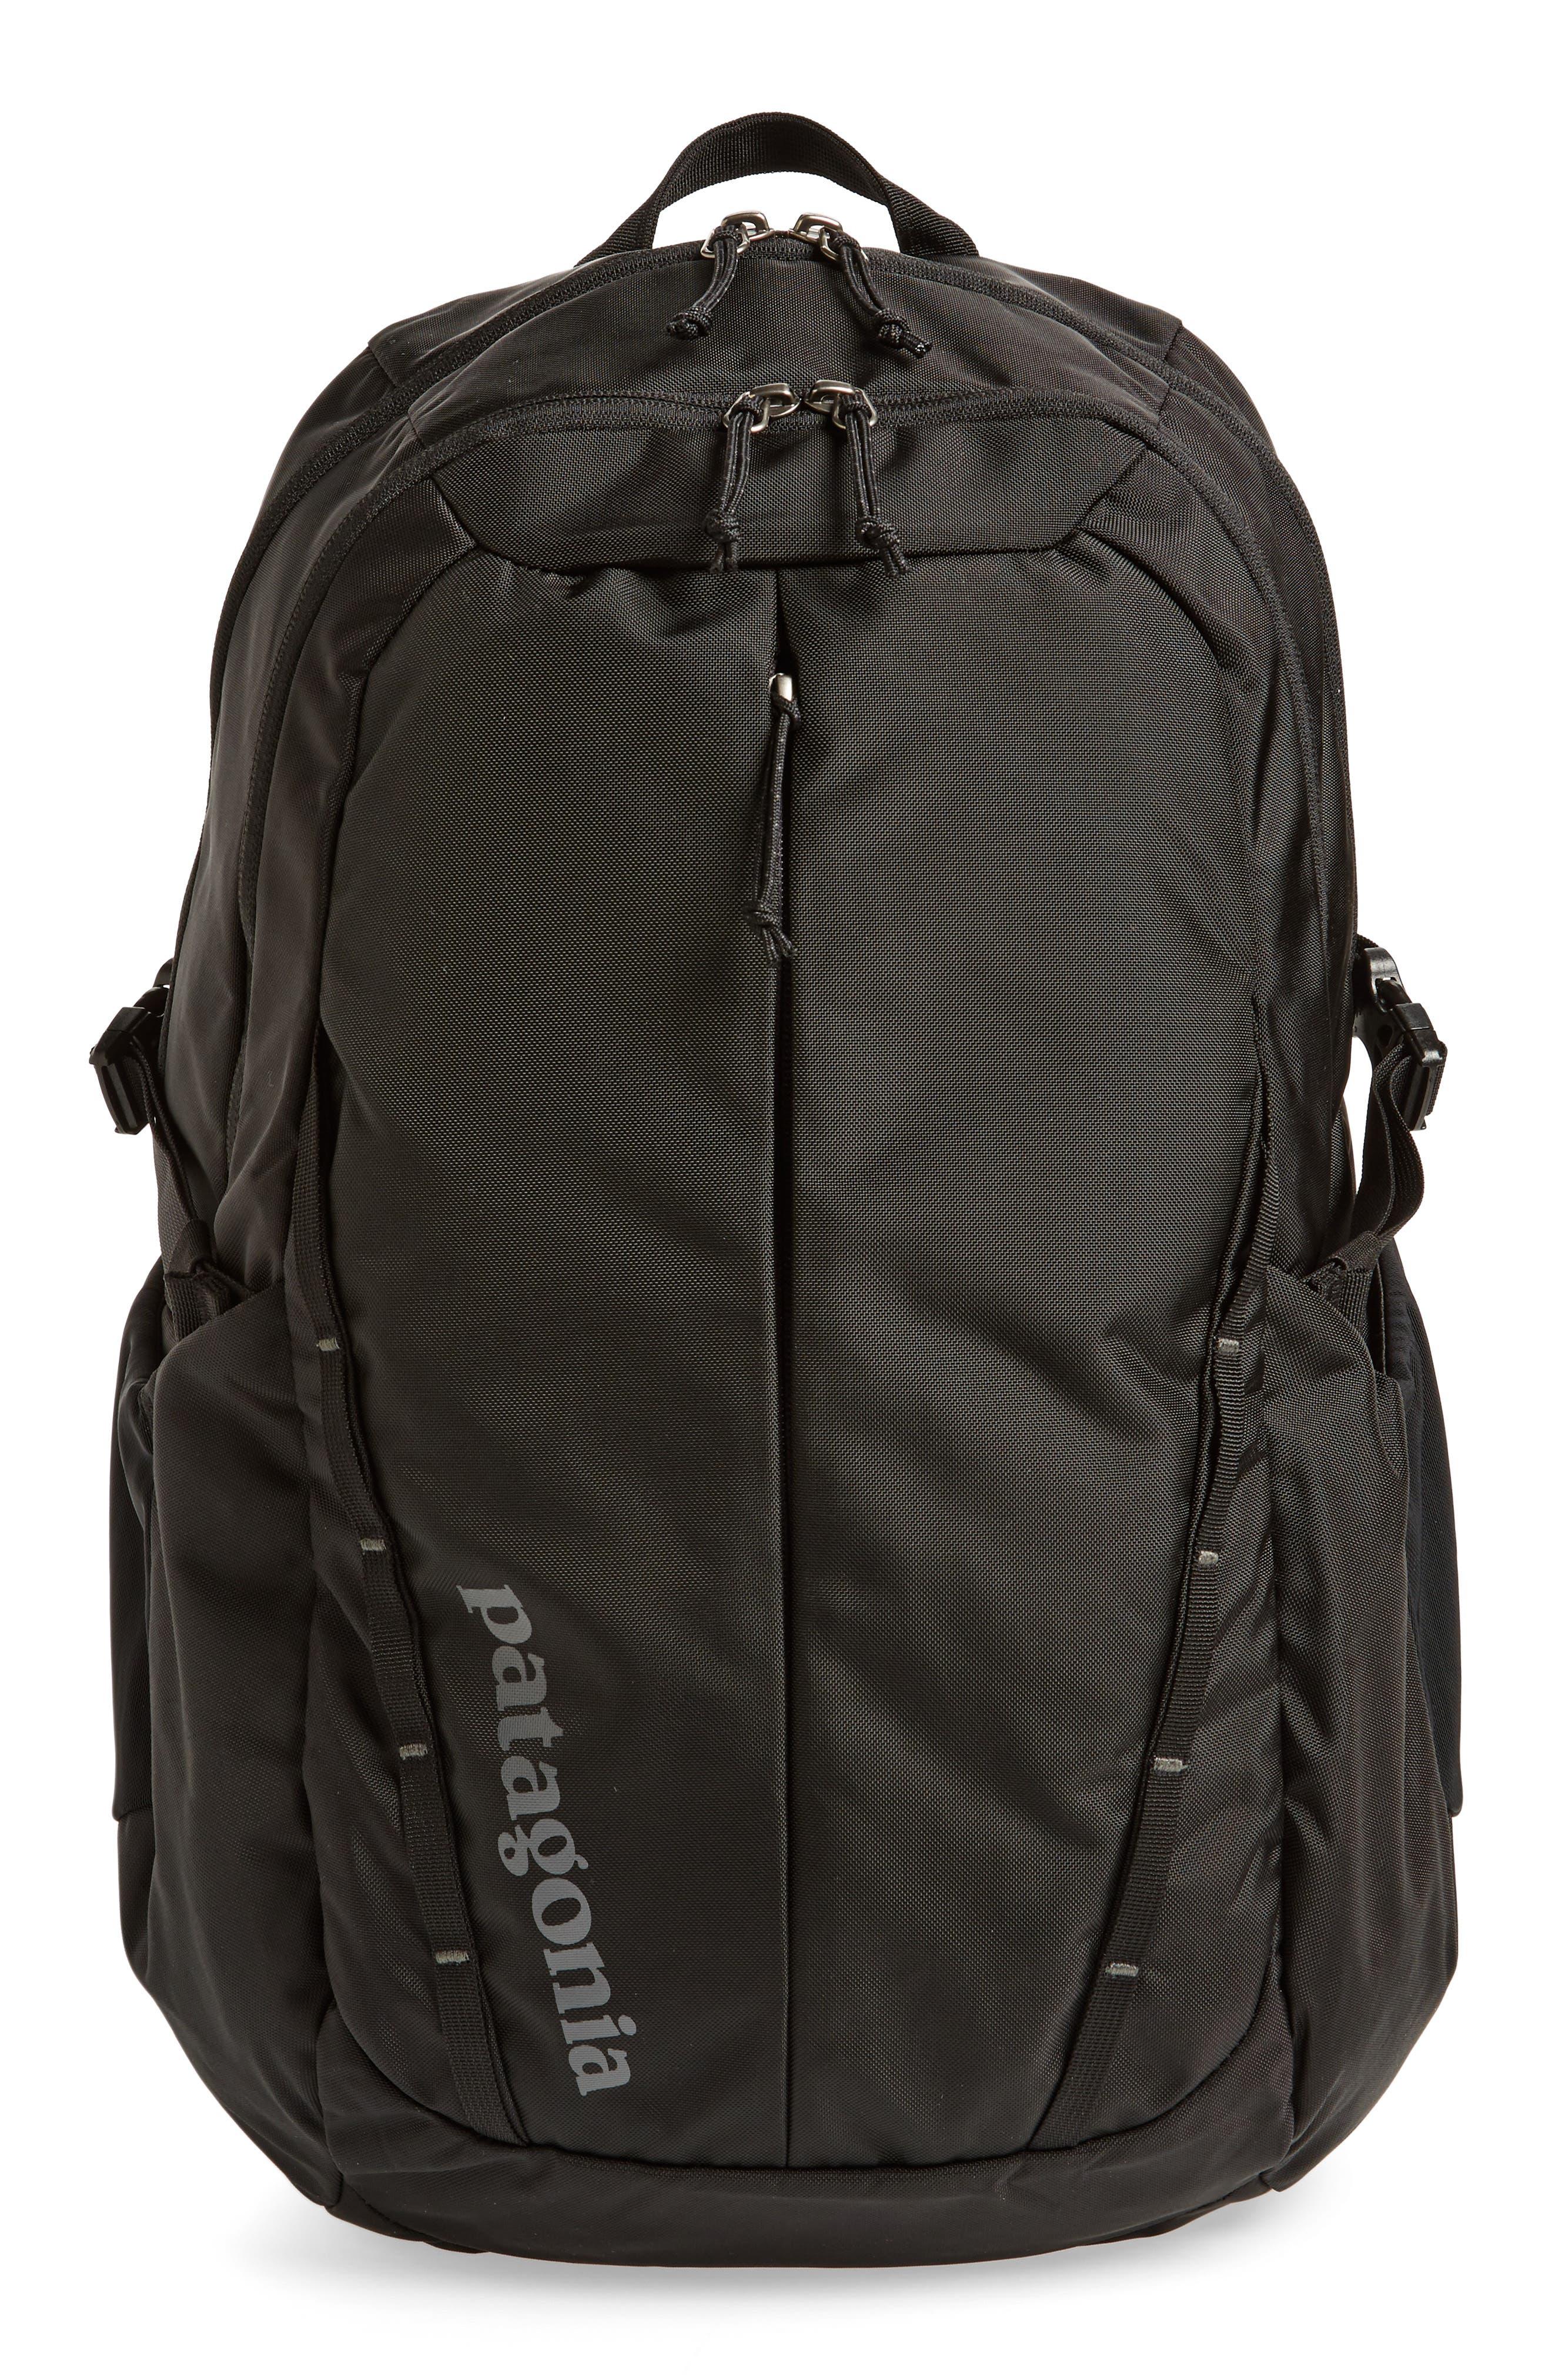 Patagonia Refugio 28-Liter Backpack -